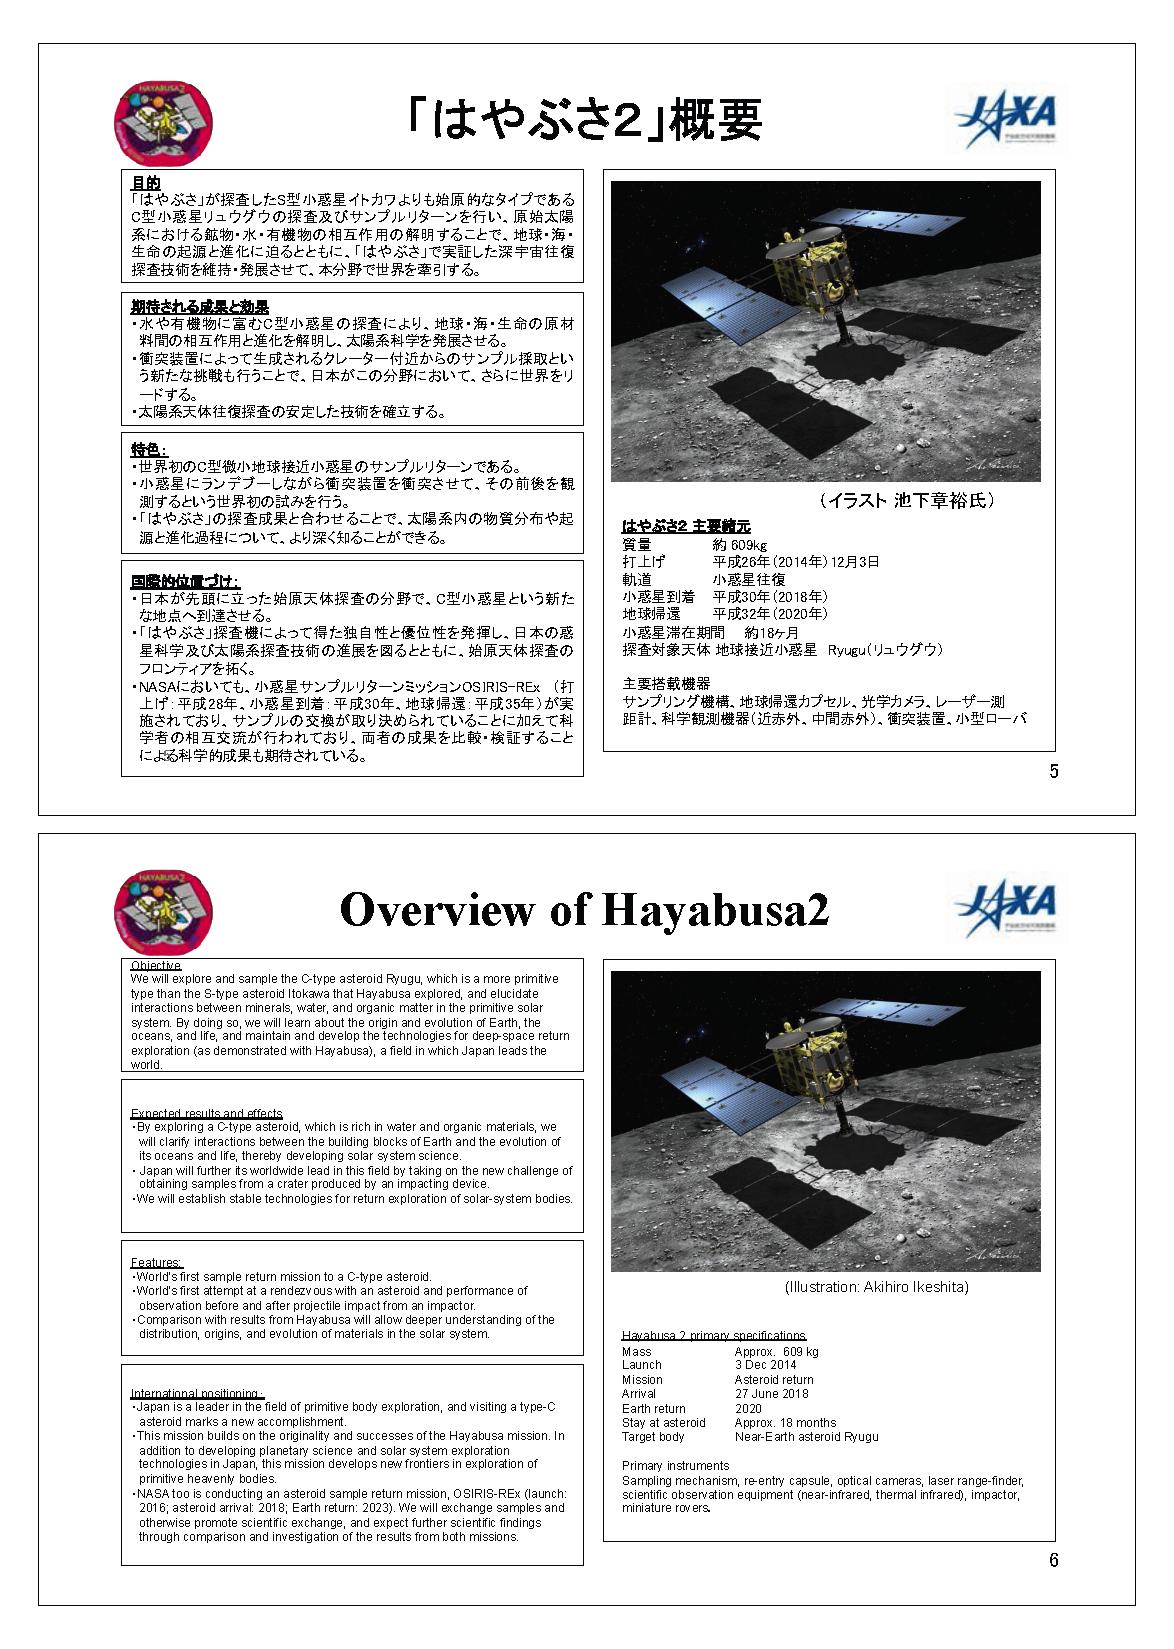 f:id:Imamura:20180823155918p:plain